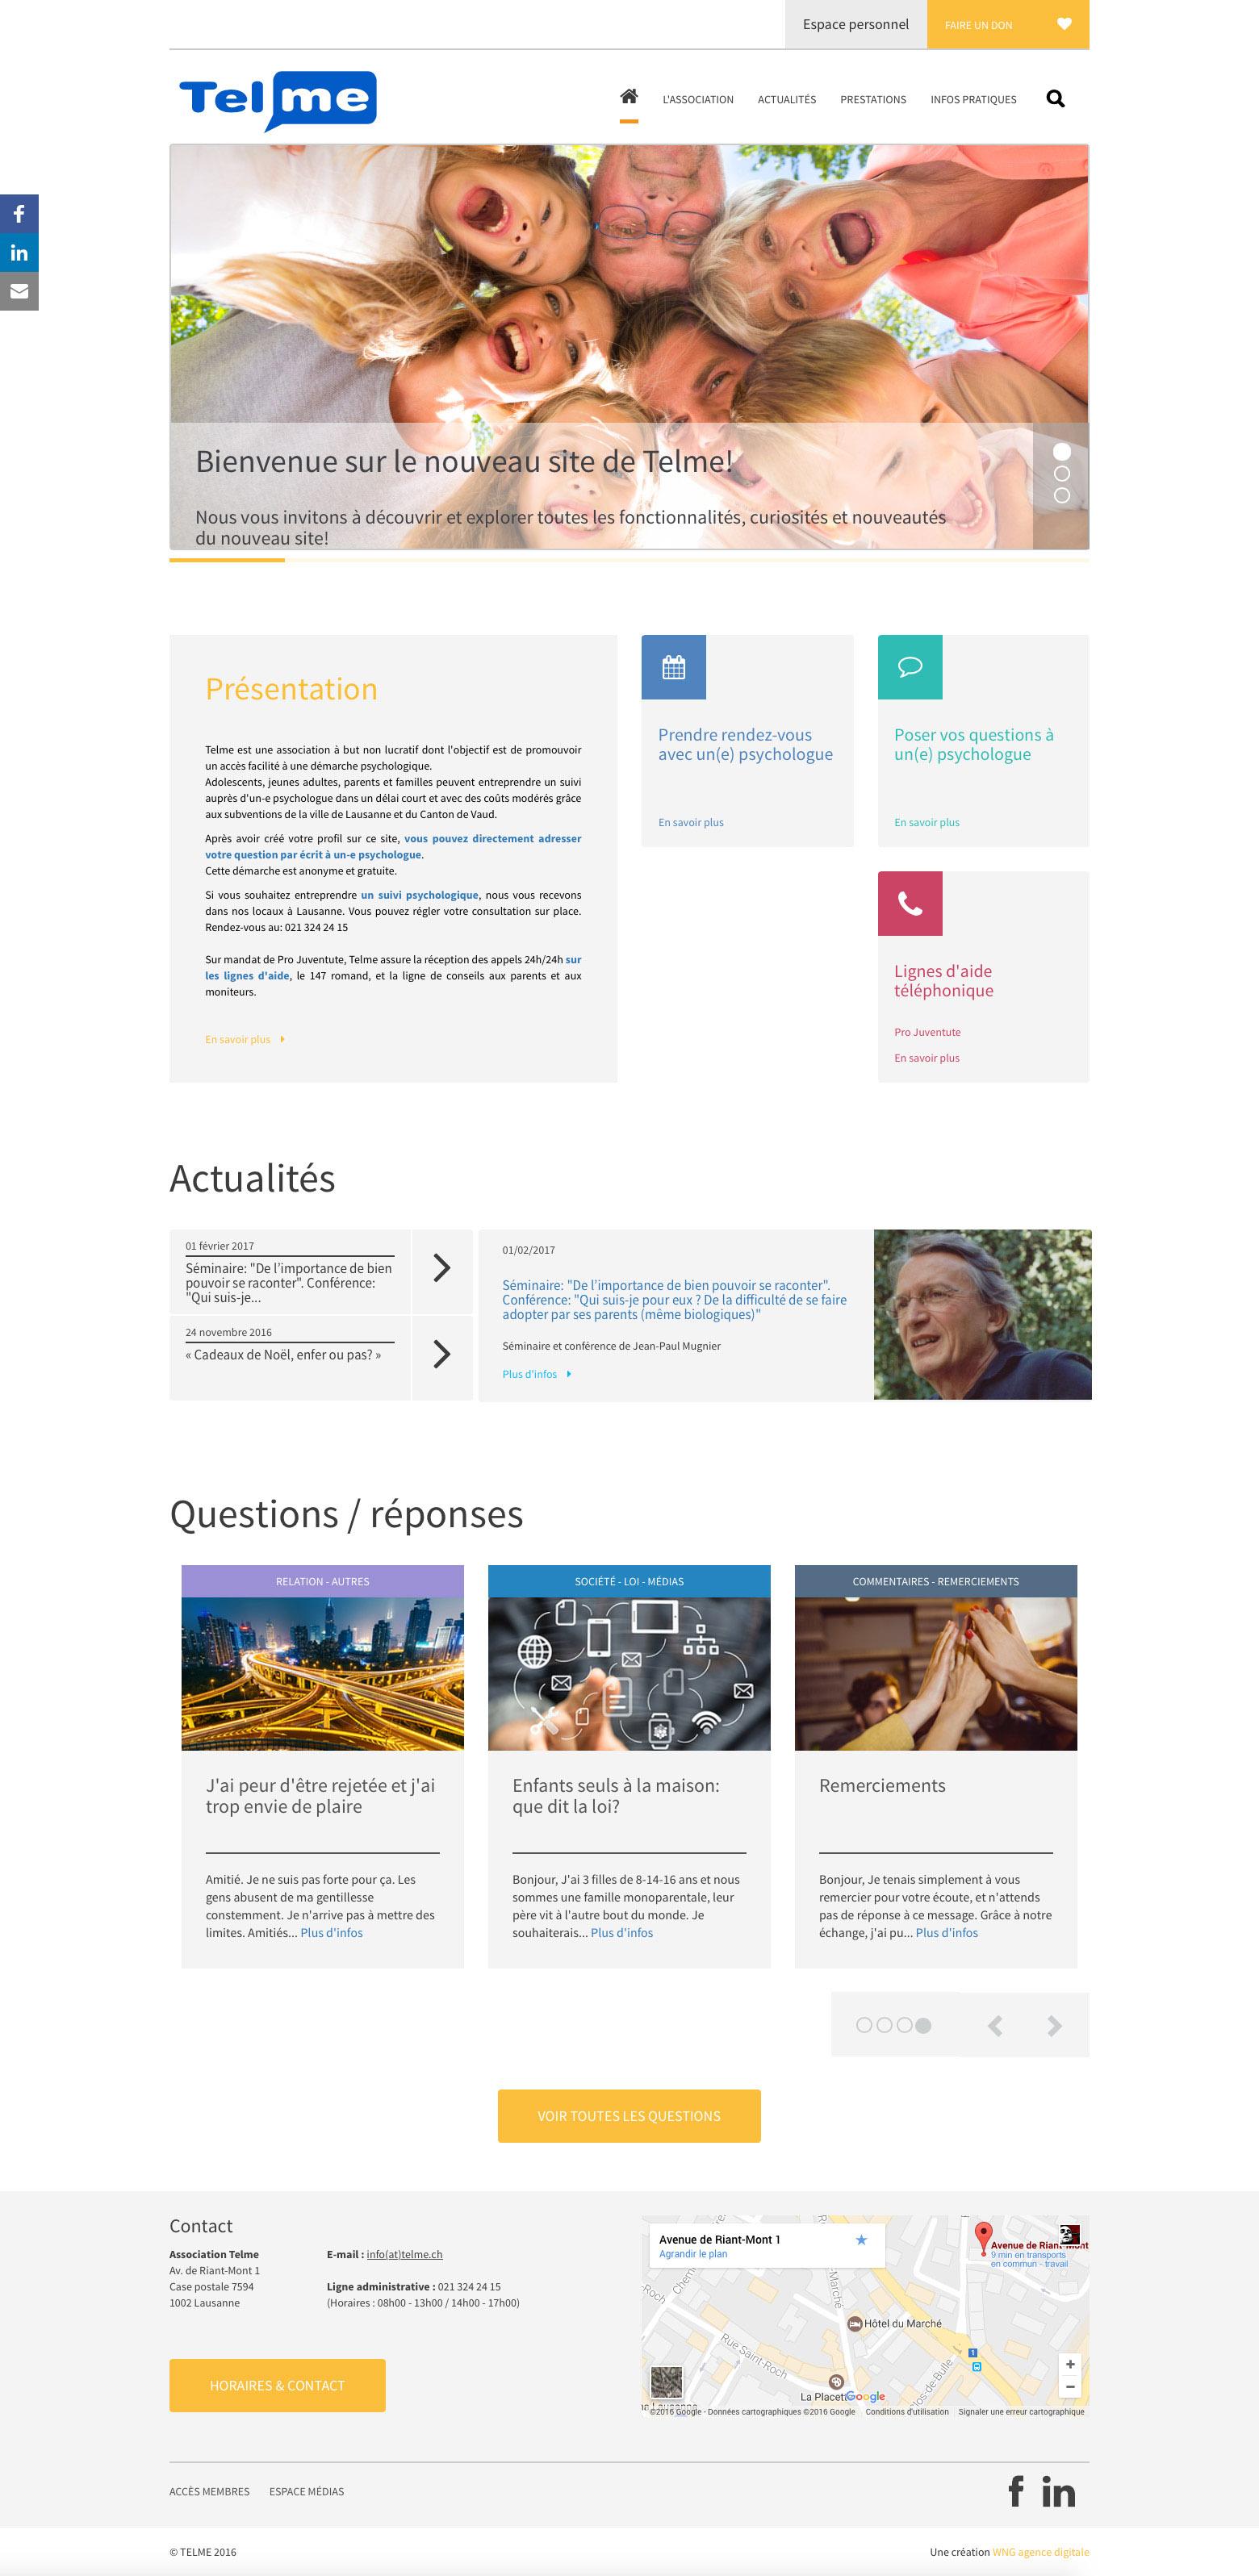 Telme WNG Agence Digitale